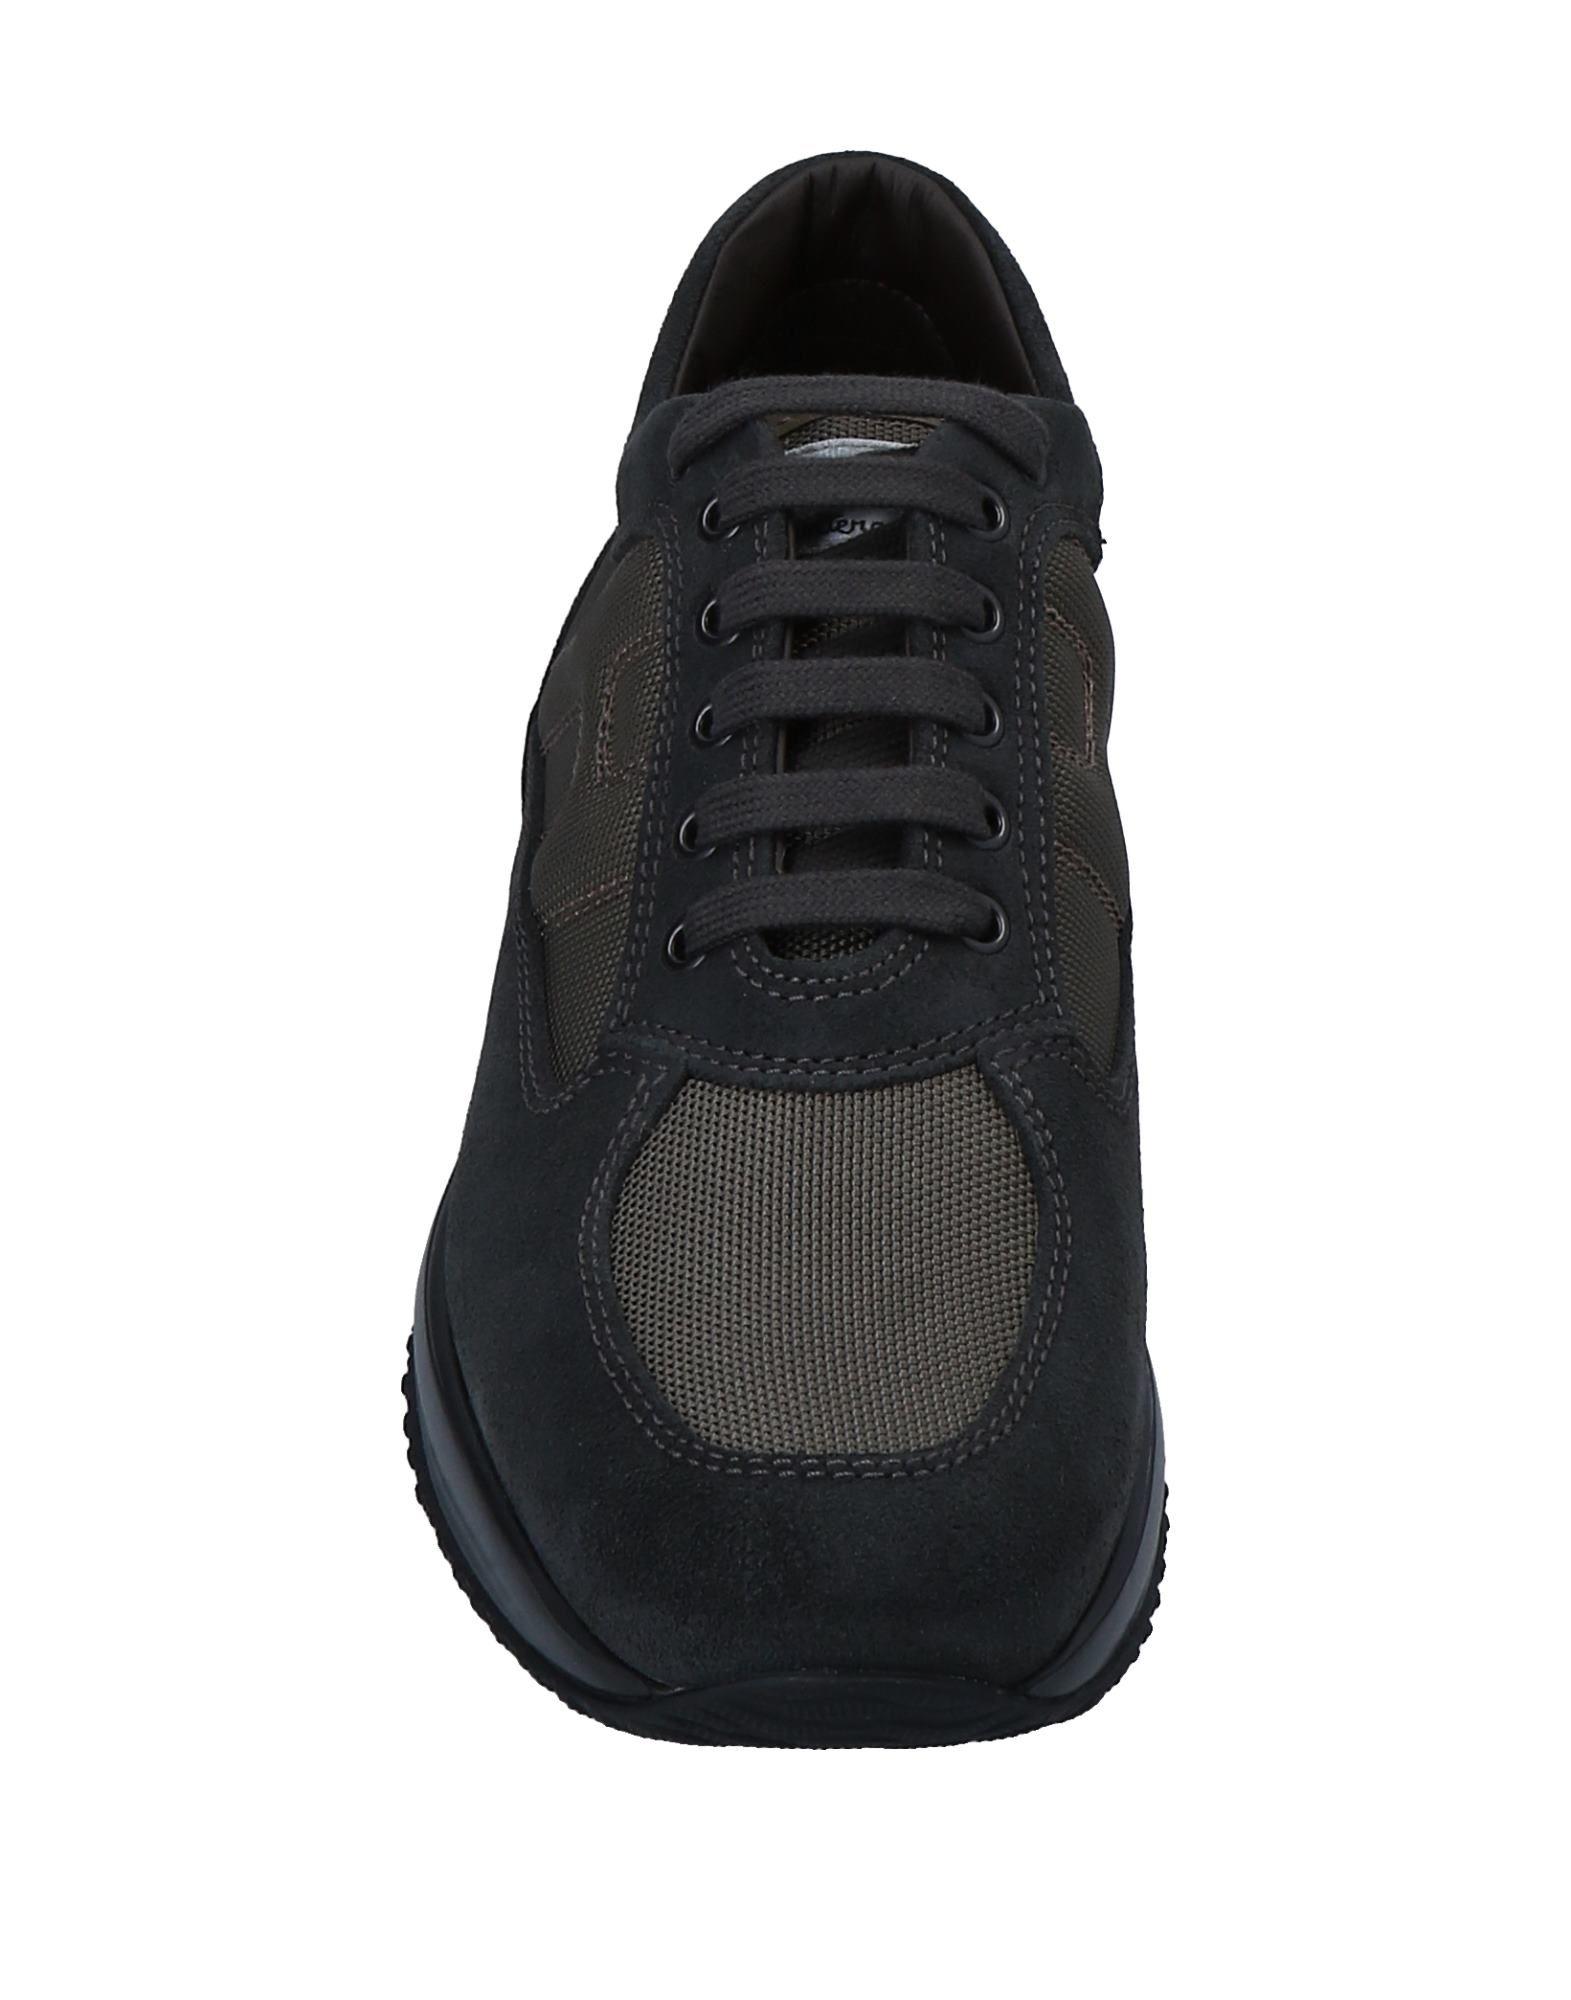 Hogan Sneakers Qualität Herren  11556115FP Gute Qualität Sneakers beliebte Schuhe 4f54b8